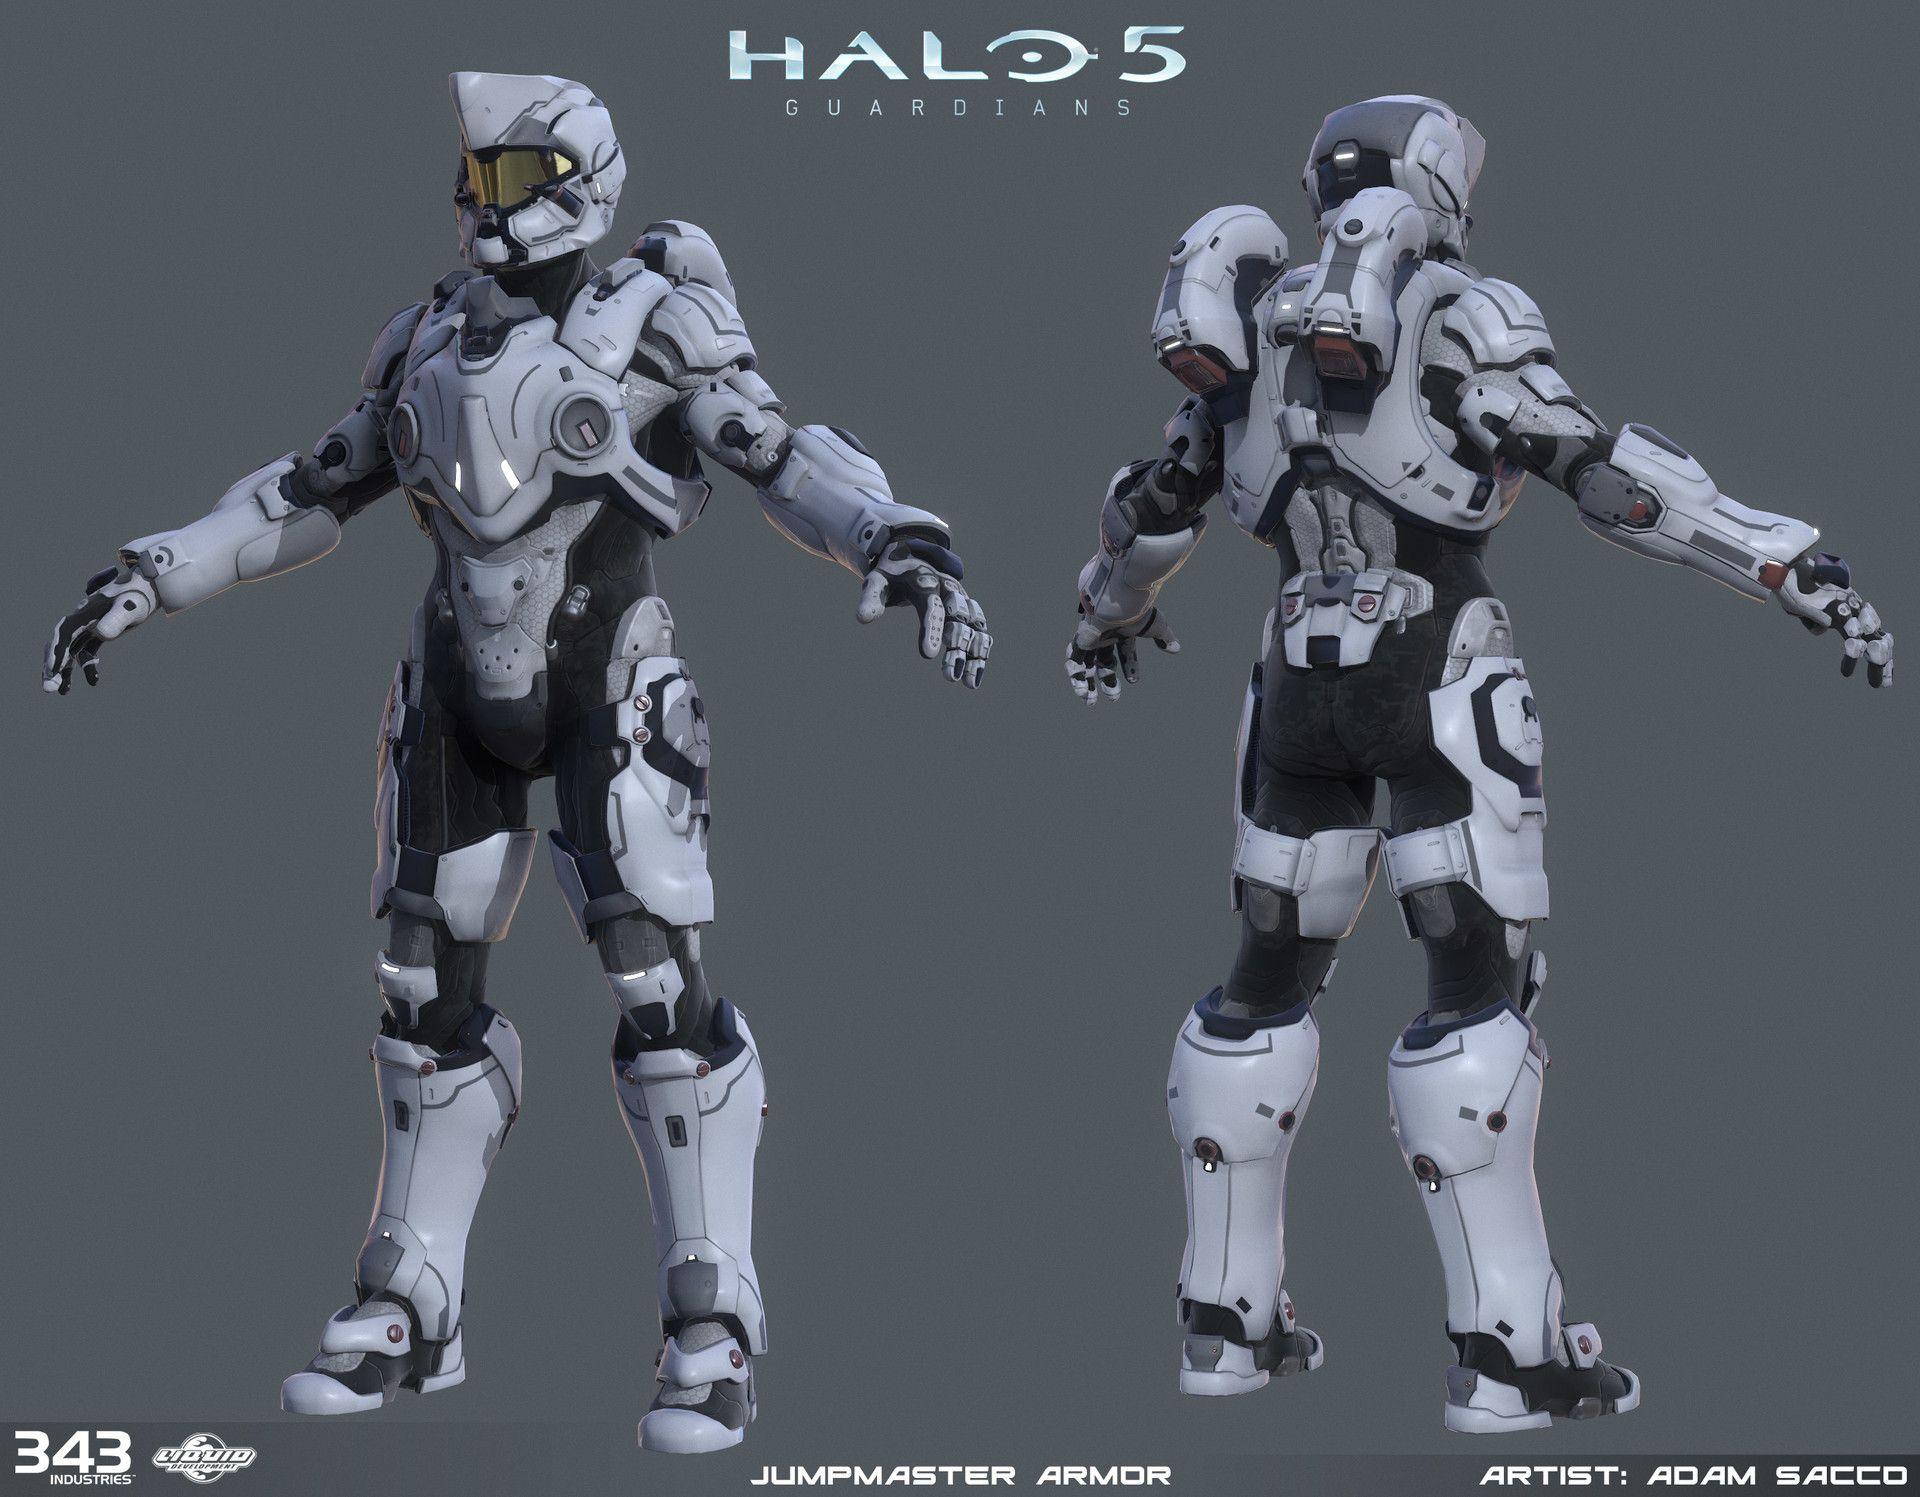 ArtStation - Halo 5 - Jumpmaster armor - 3d game model, Adam Sacco ...